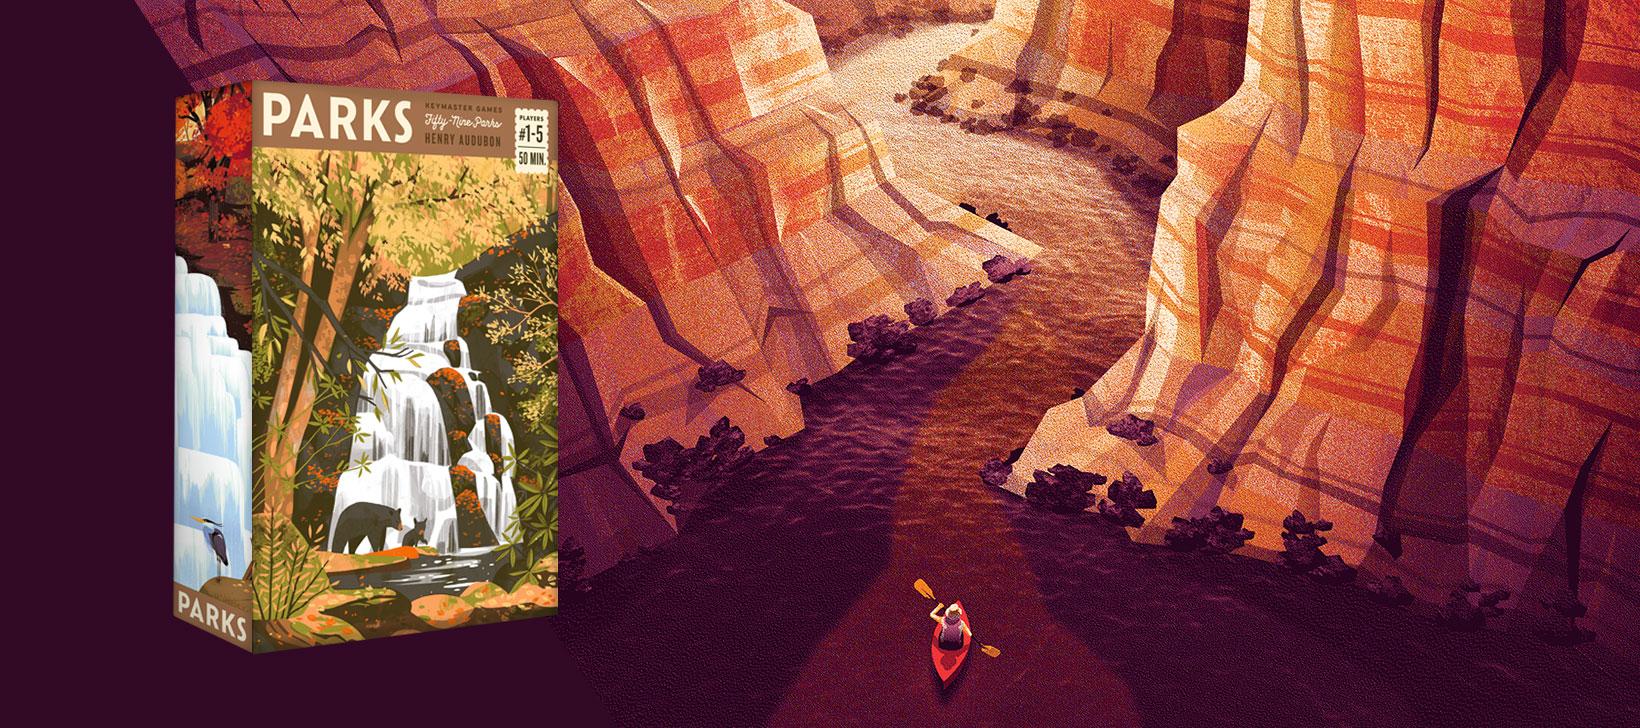 More Games Please: Art in Board Games Interviews | BoardGameGeek